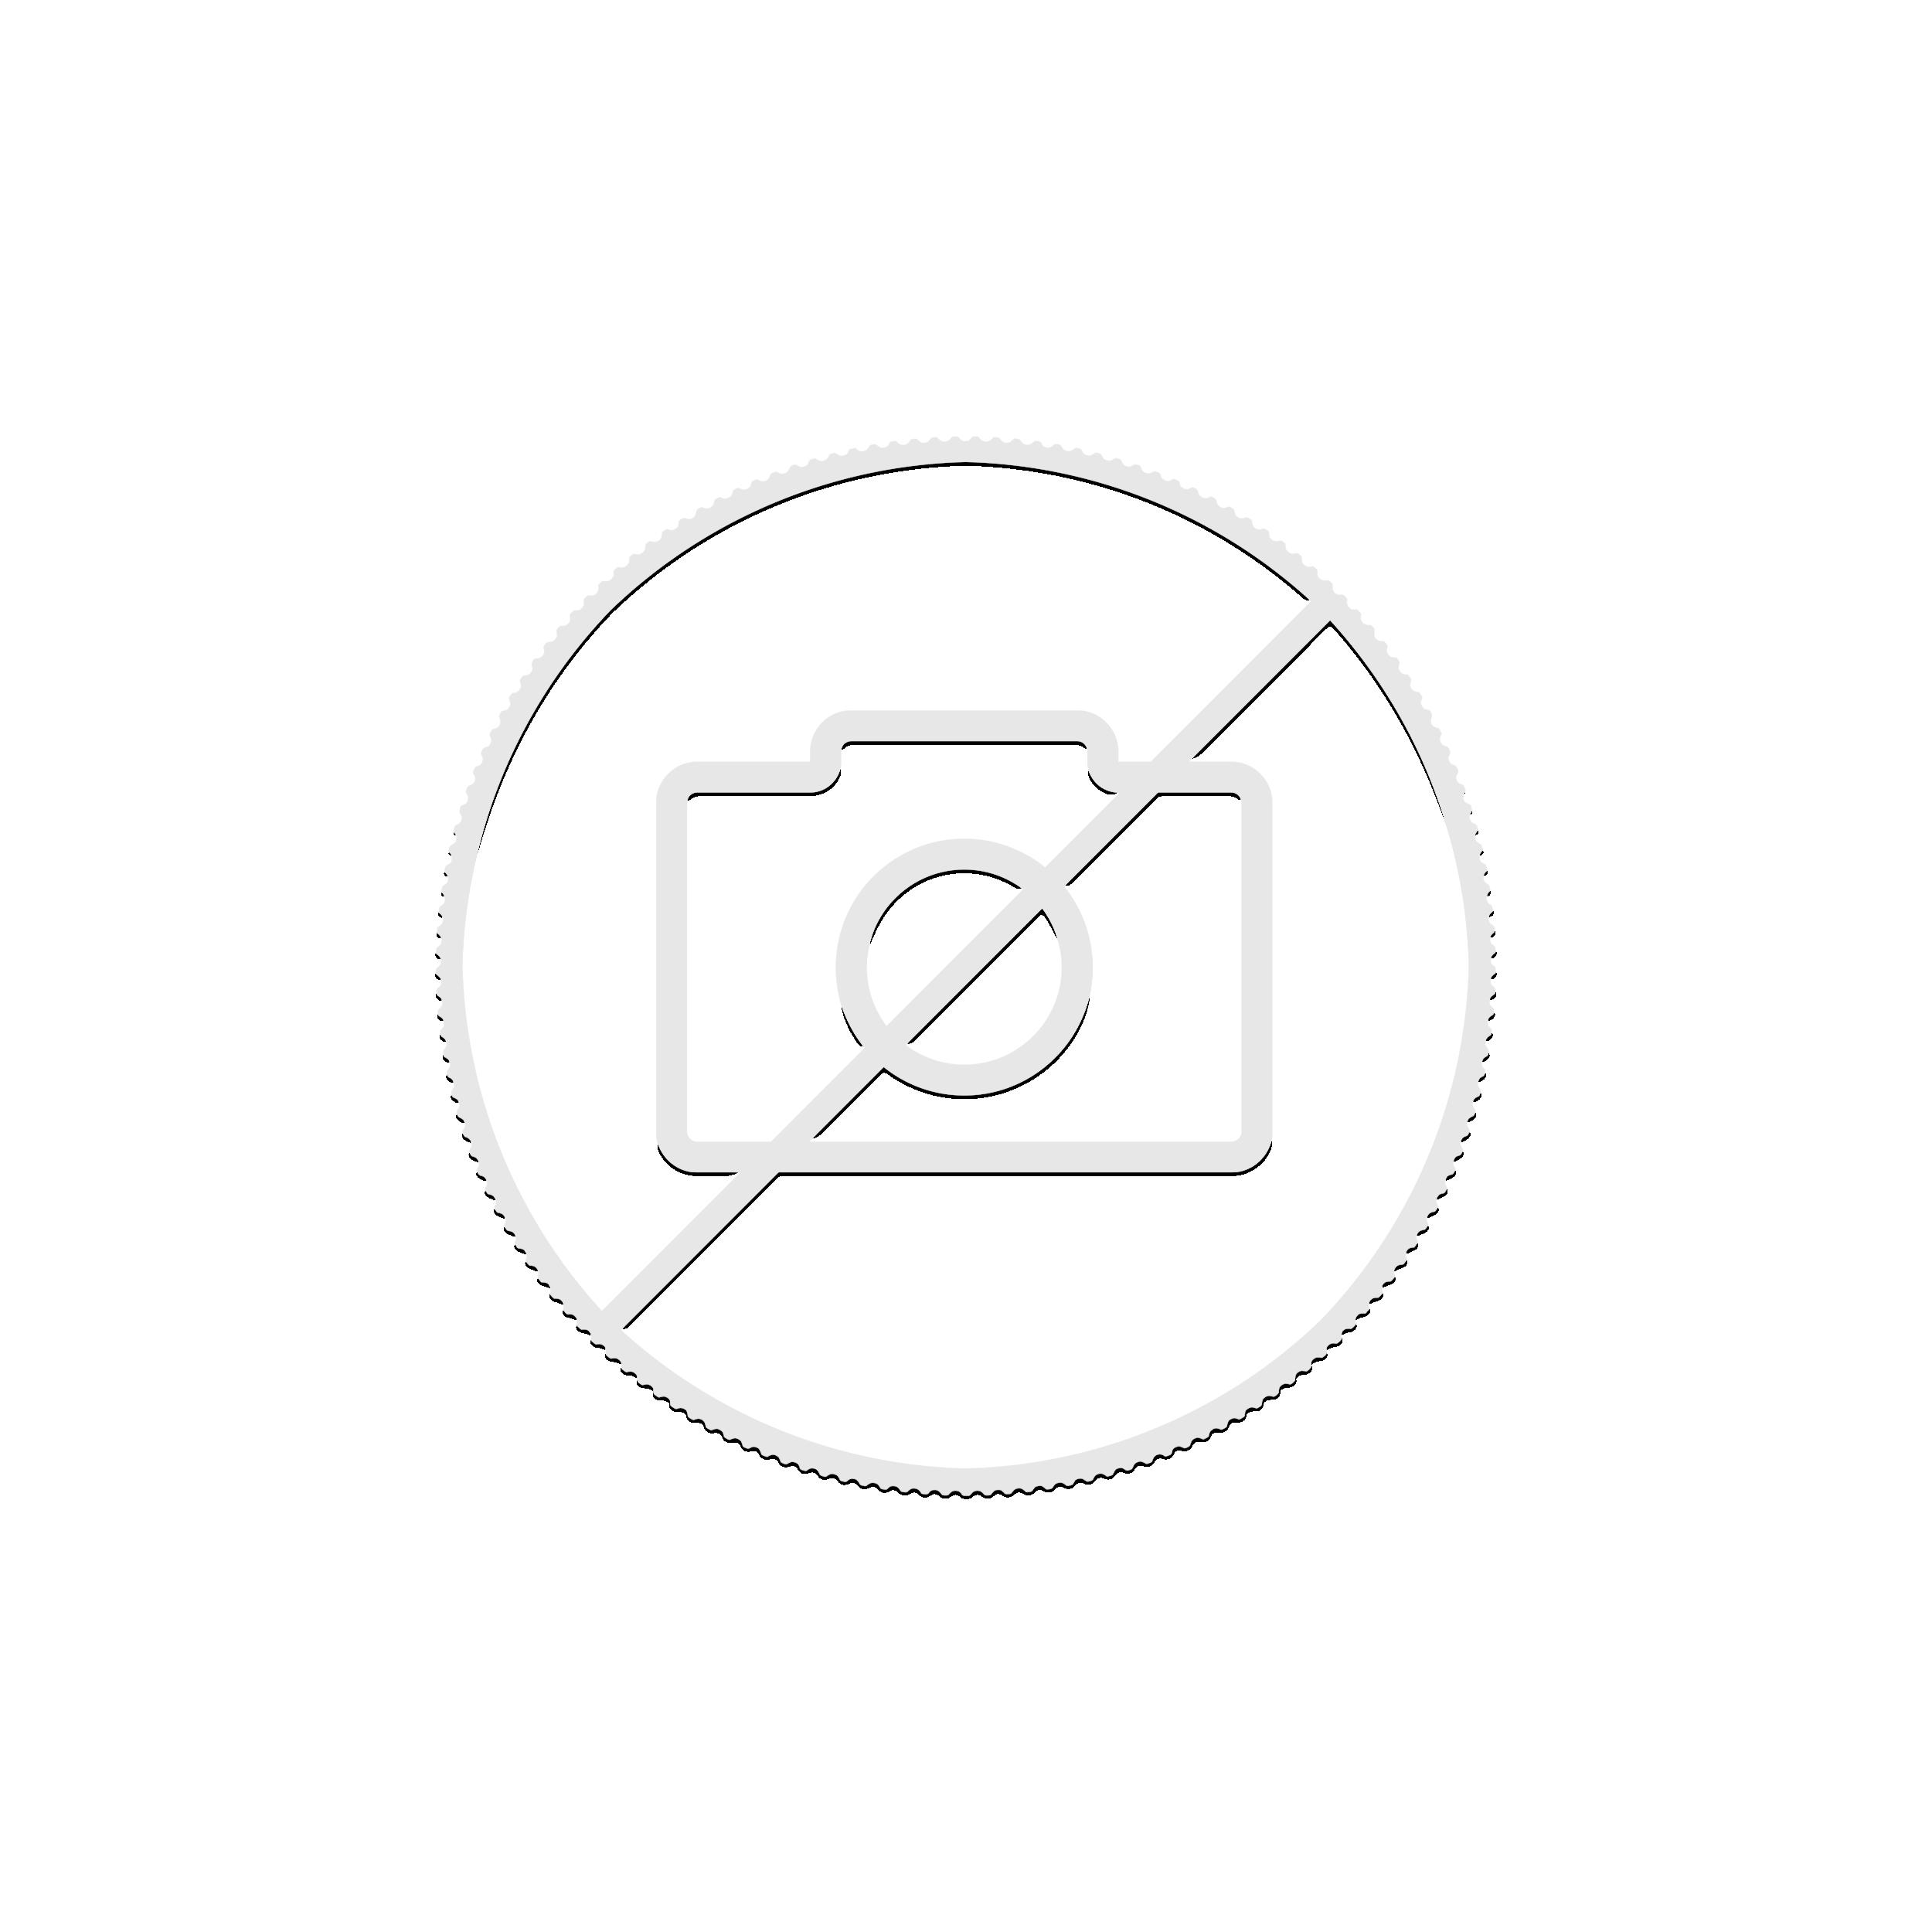 10 Troy ounce zilveren munt Magnificent Maple Leaf 2019